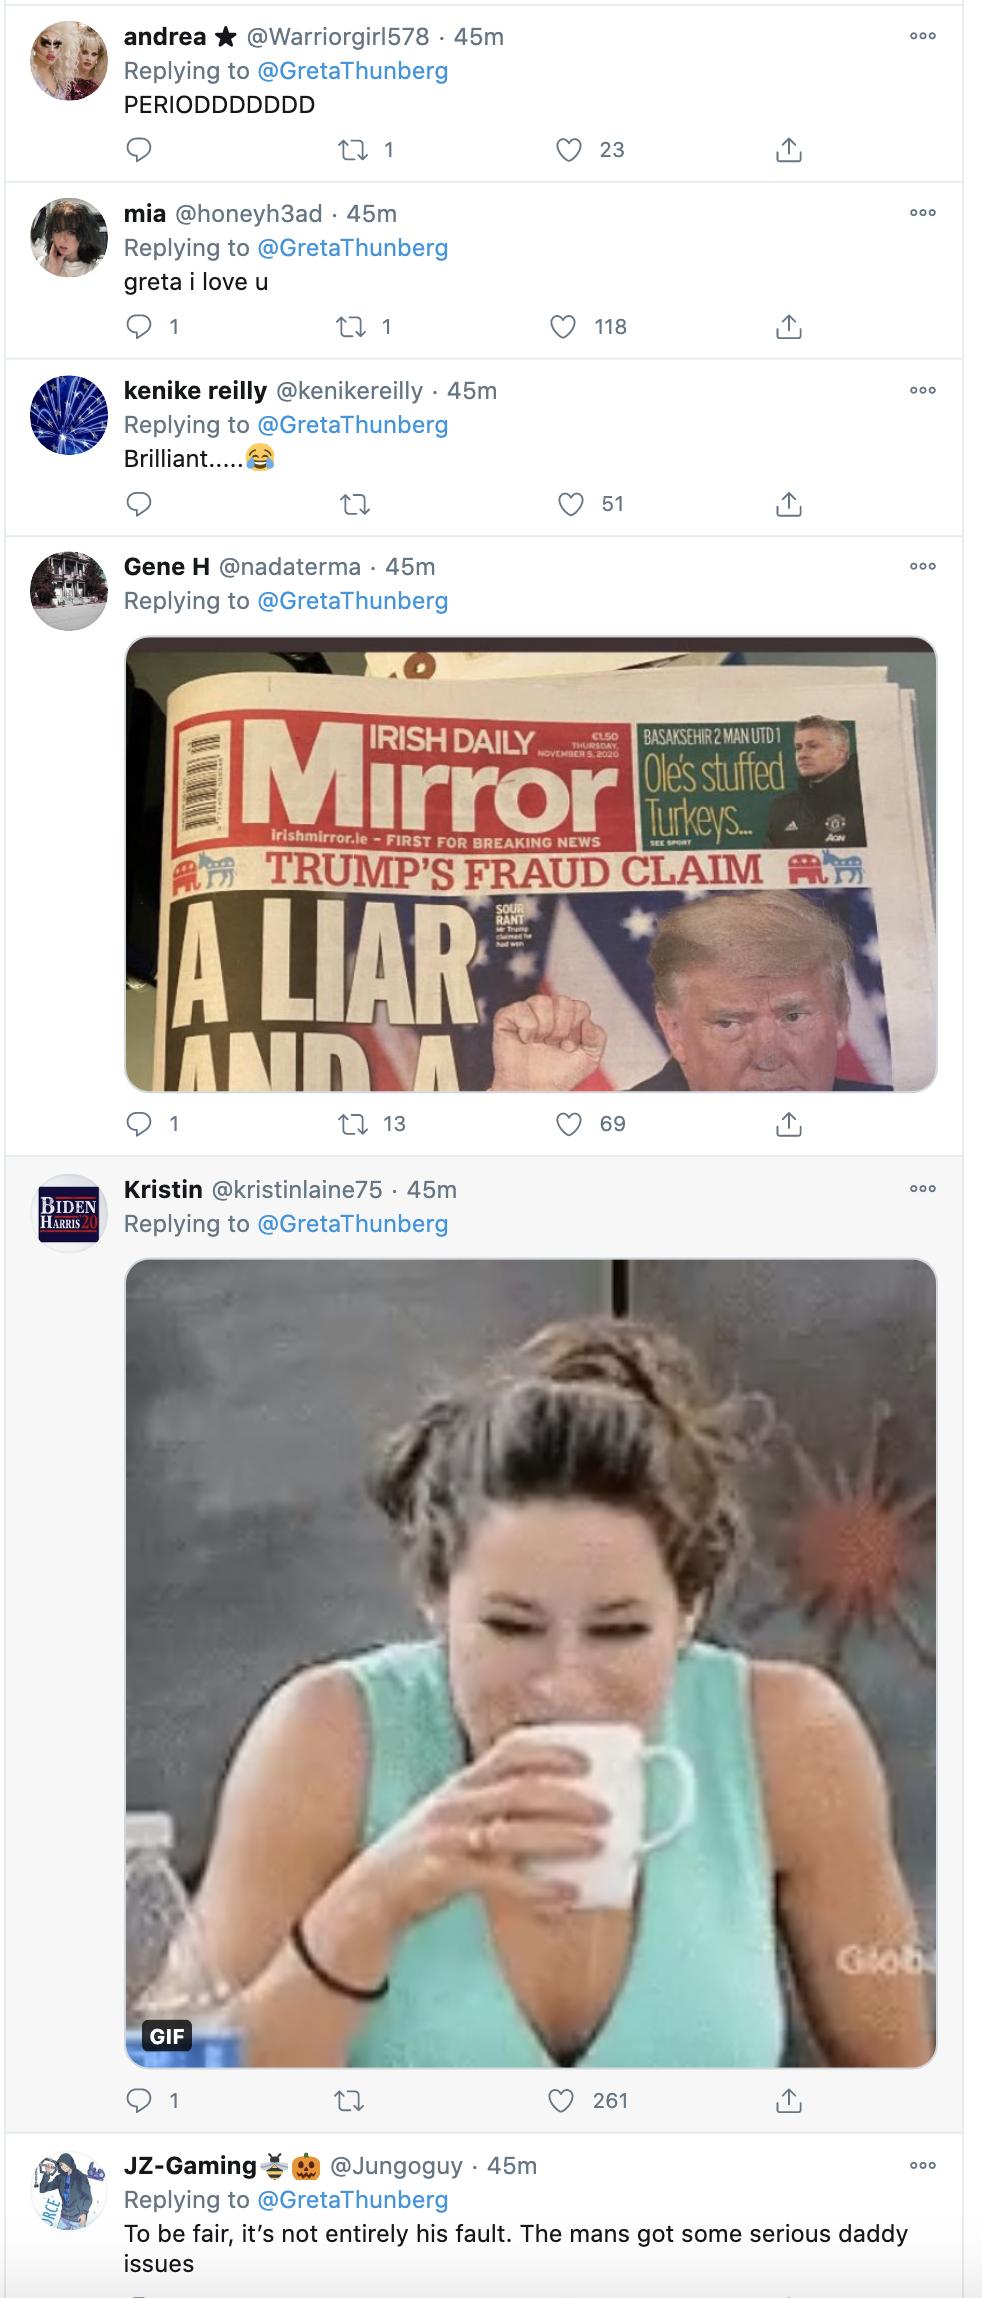 Screen-Shot-2020-11-05-at-2.39.42-PM Greta Thunberg Trolls Trump Like A Boss: 'Chill Donald, Chill' Activism Environment Featured Politics Top Stories